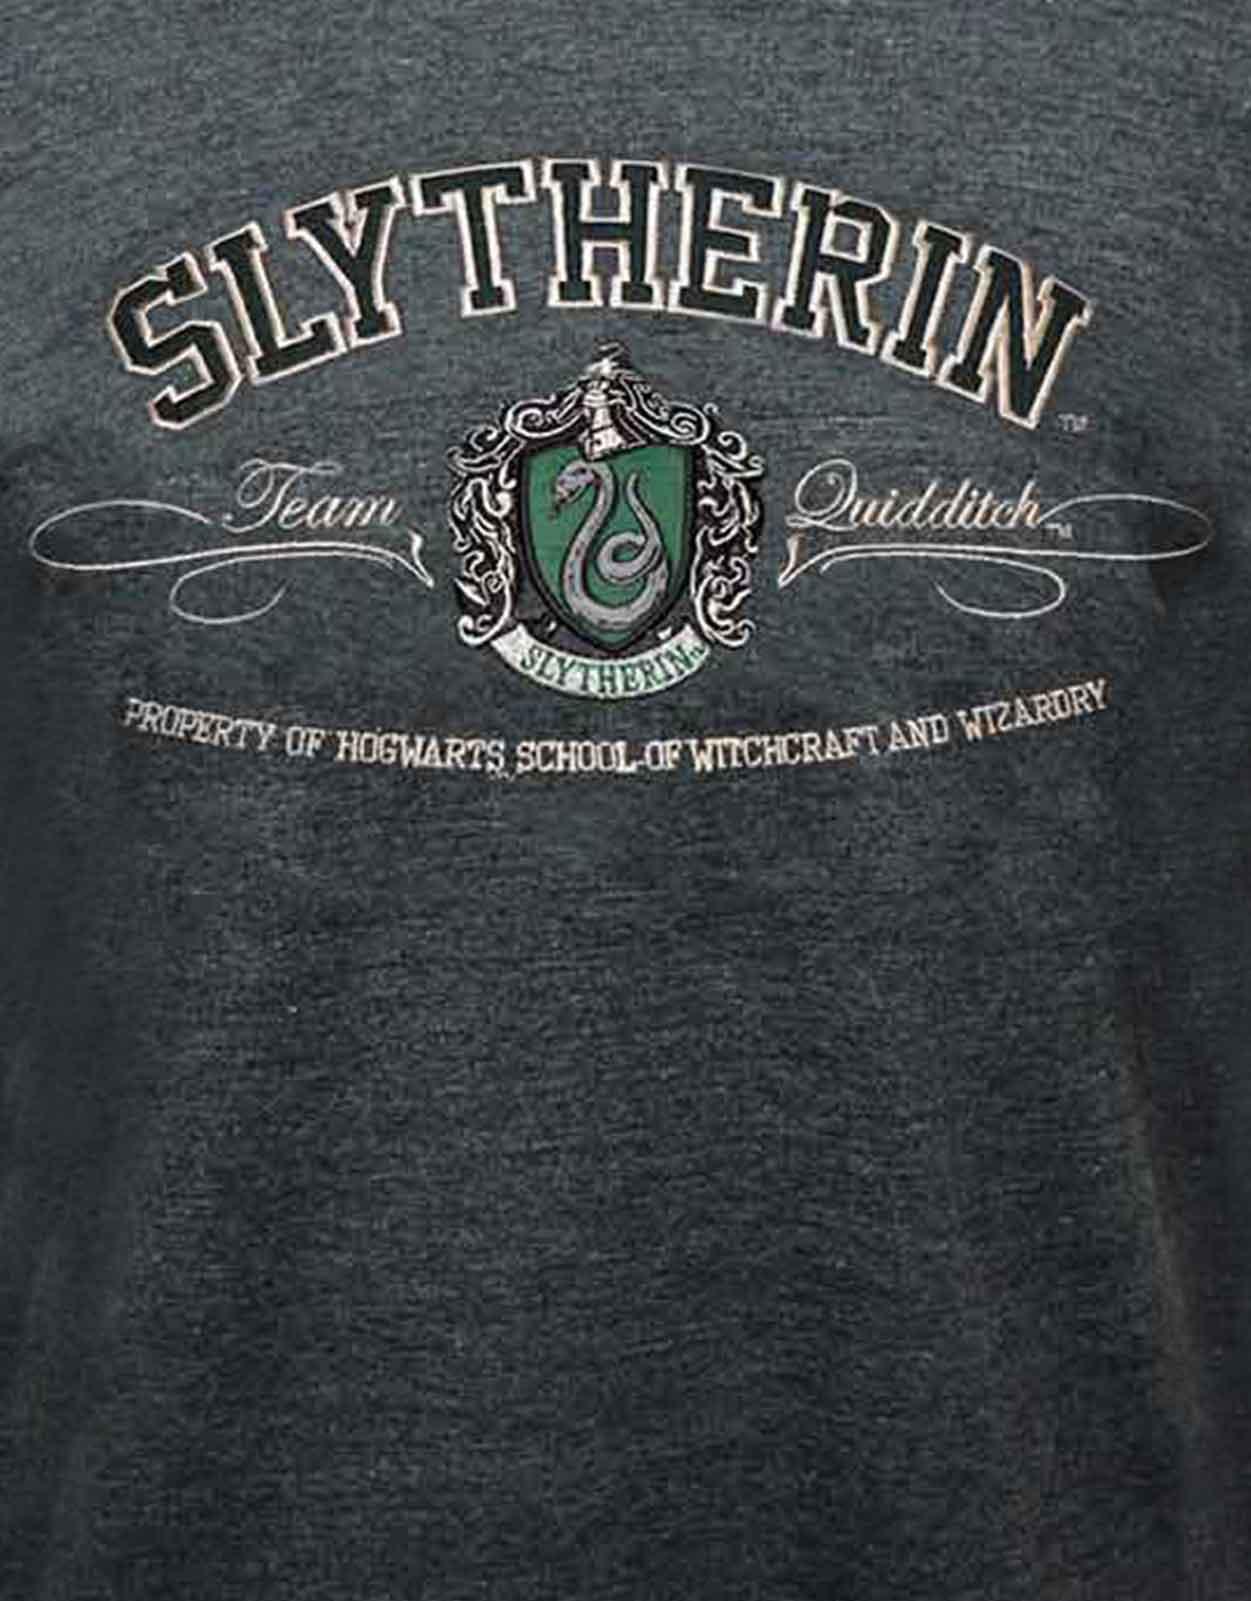 Officiel-Harry-Potter-T-Shirt-Poudlard-Gryffondor-Poufsouffle-cretes-Homme-NEUF miniature 51